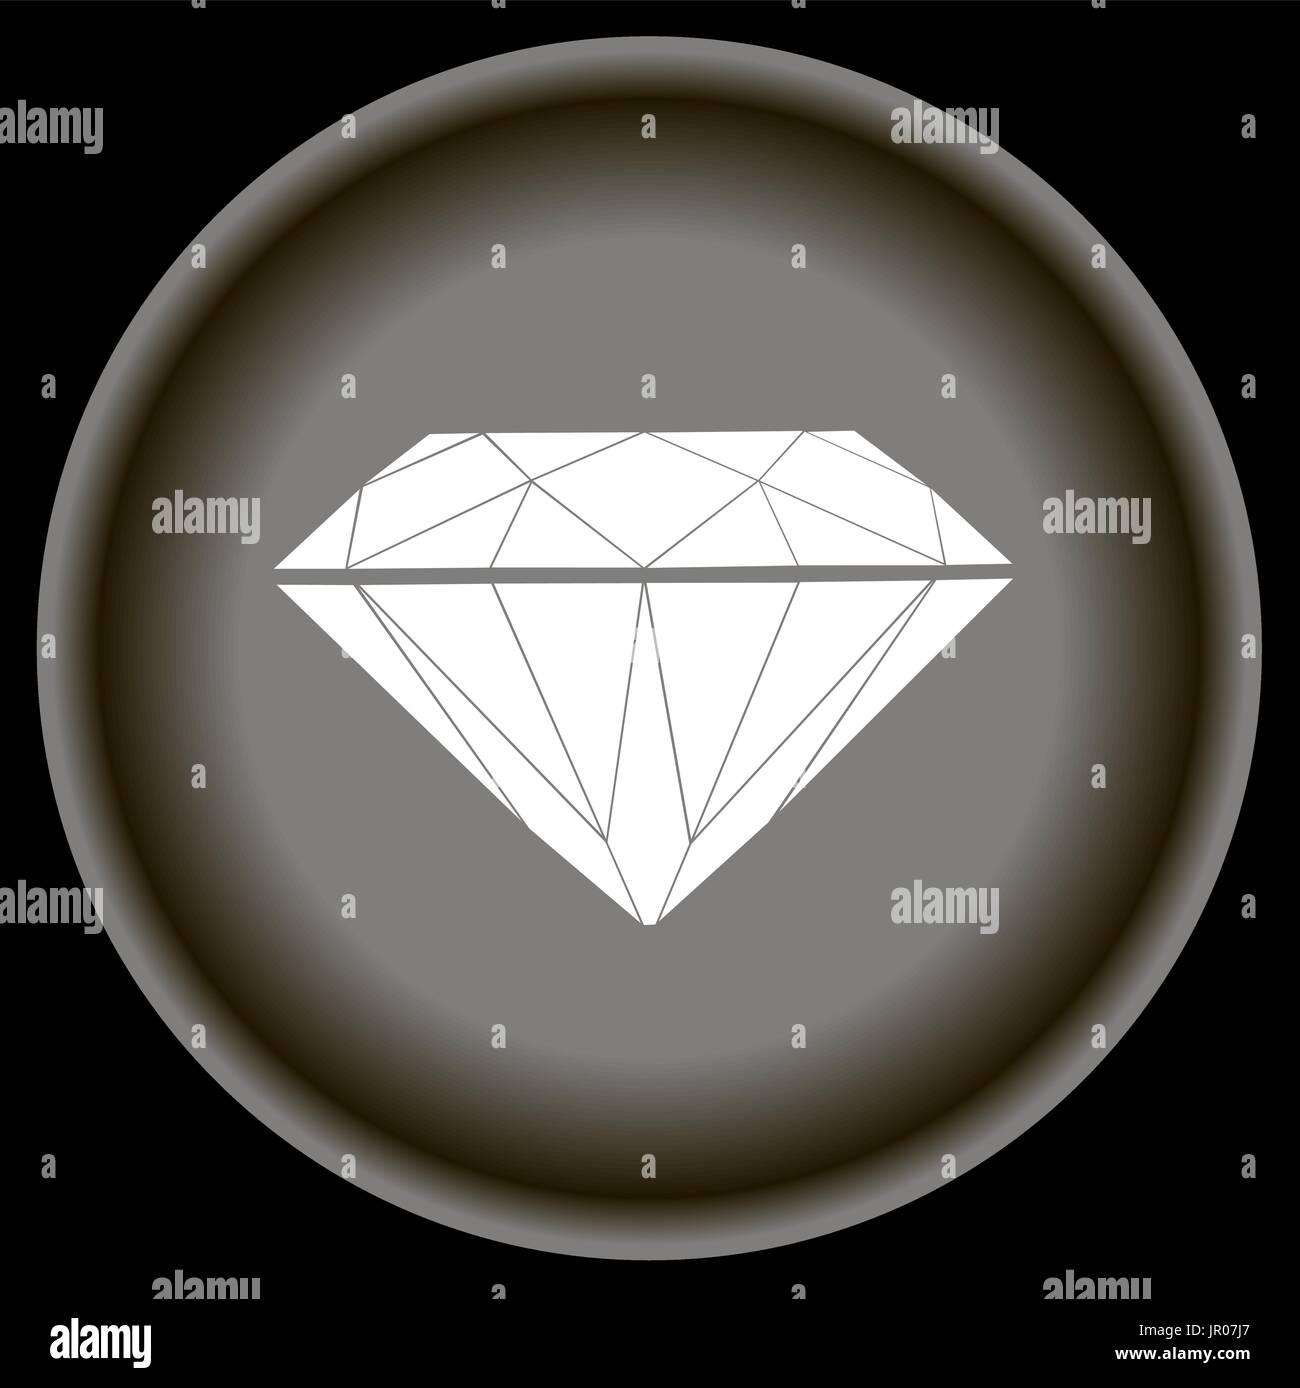 Icon Flat white Diamond on grey plate. - Stock Vector